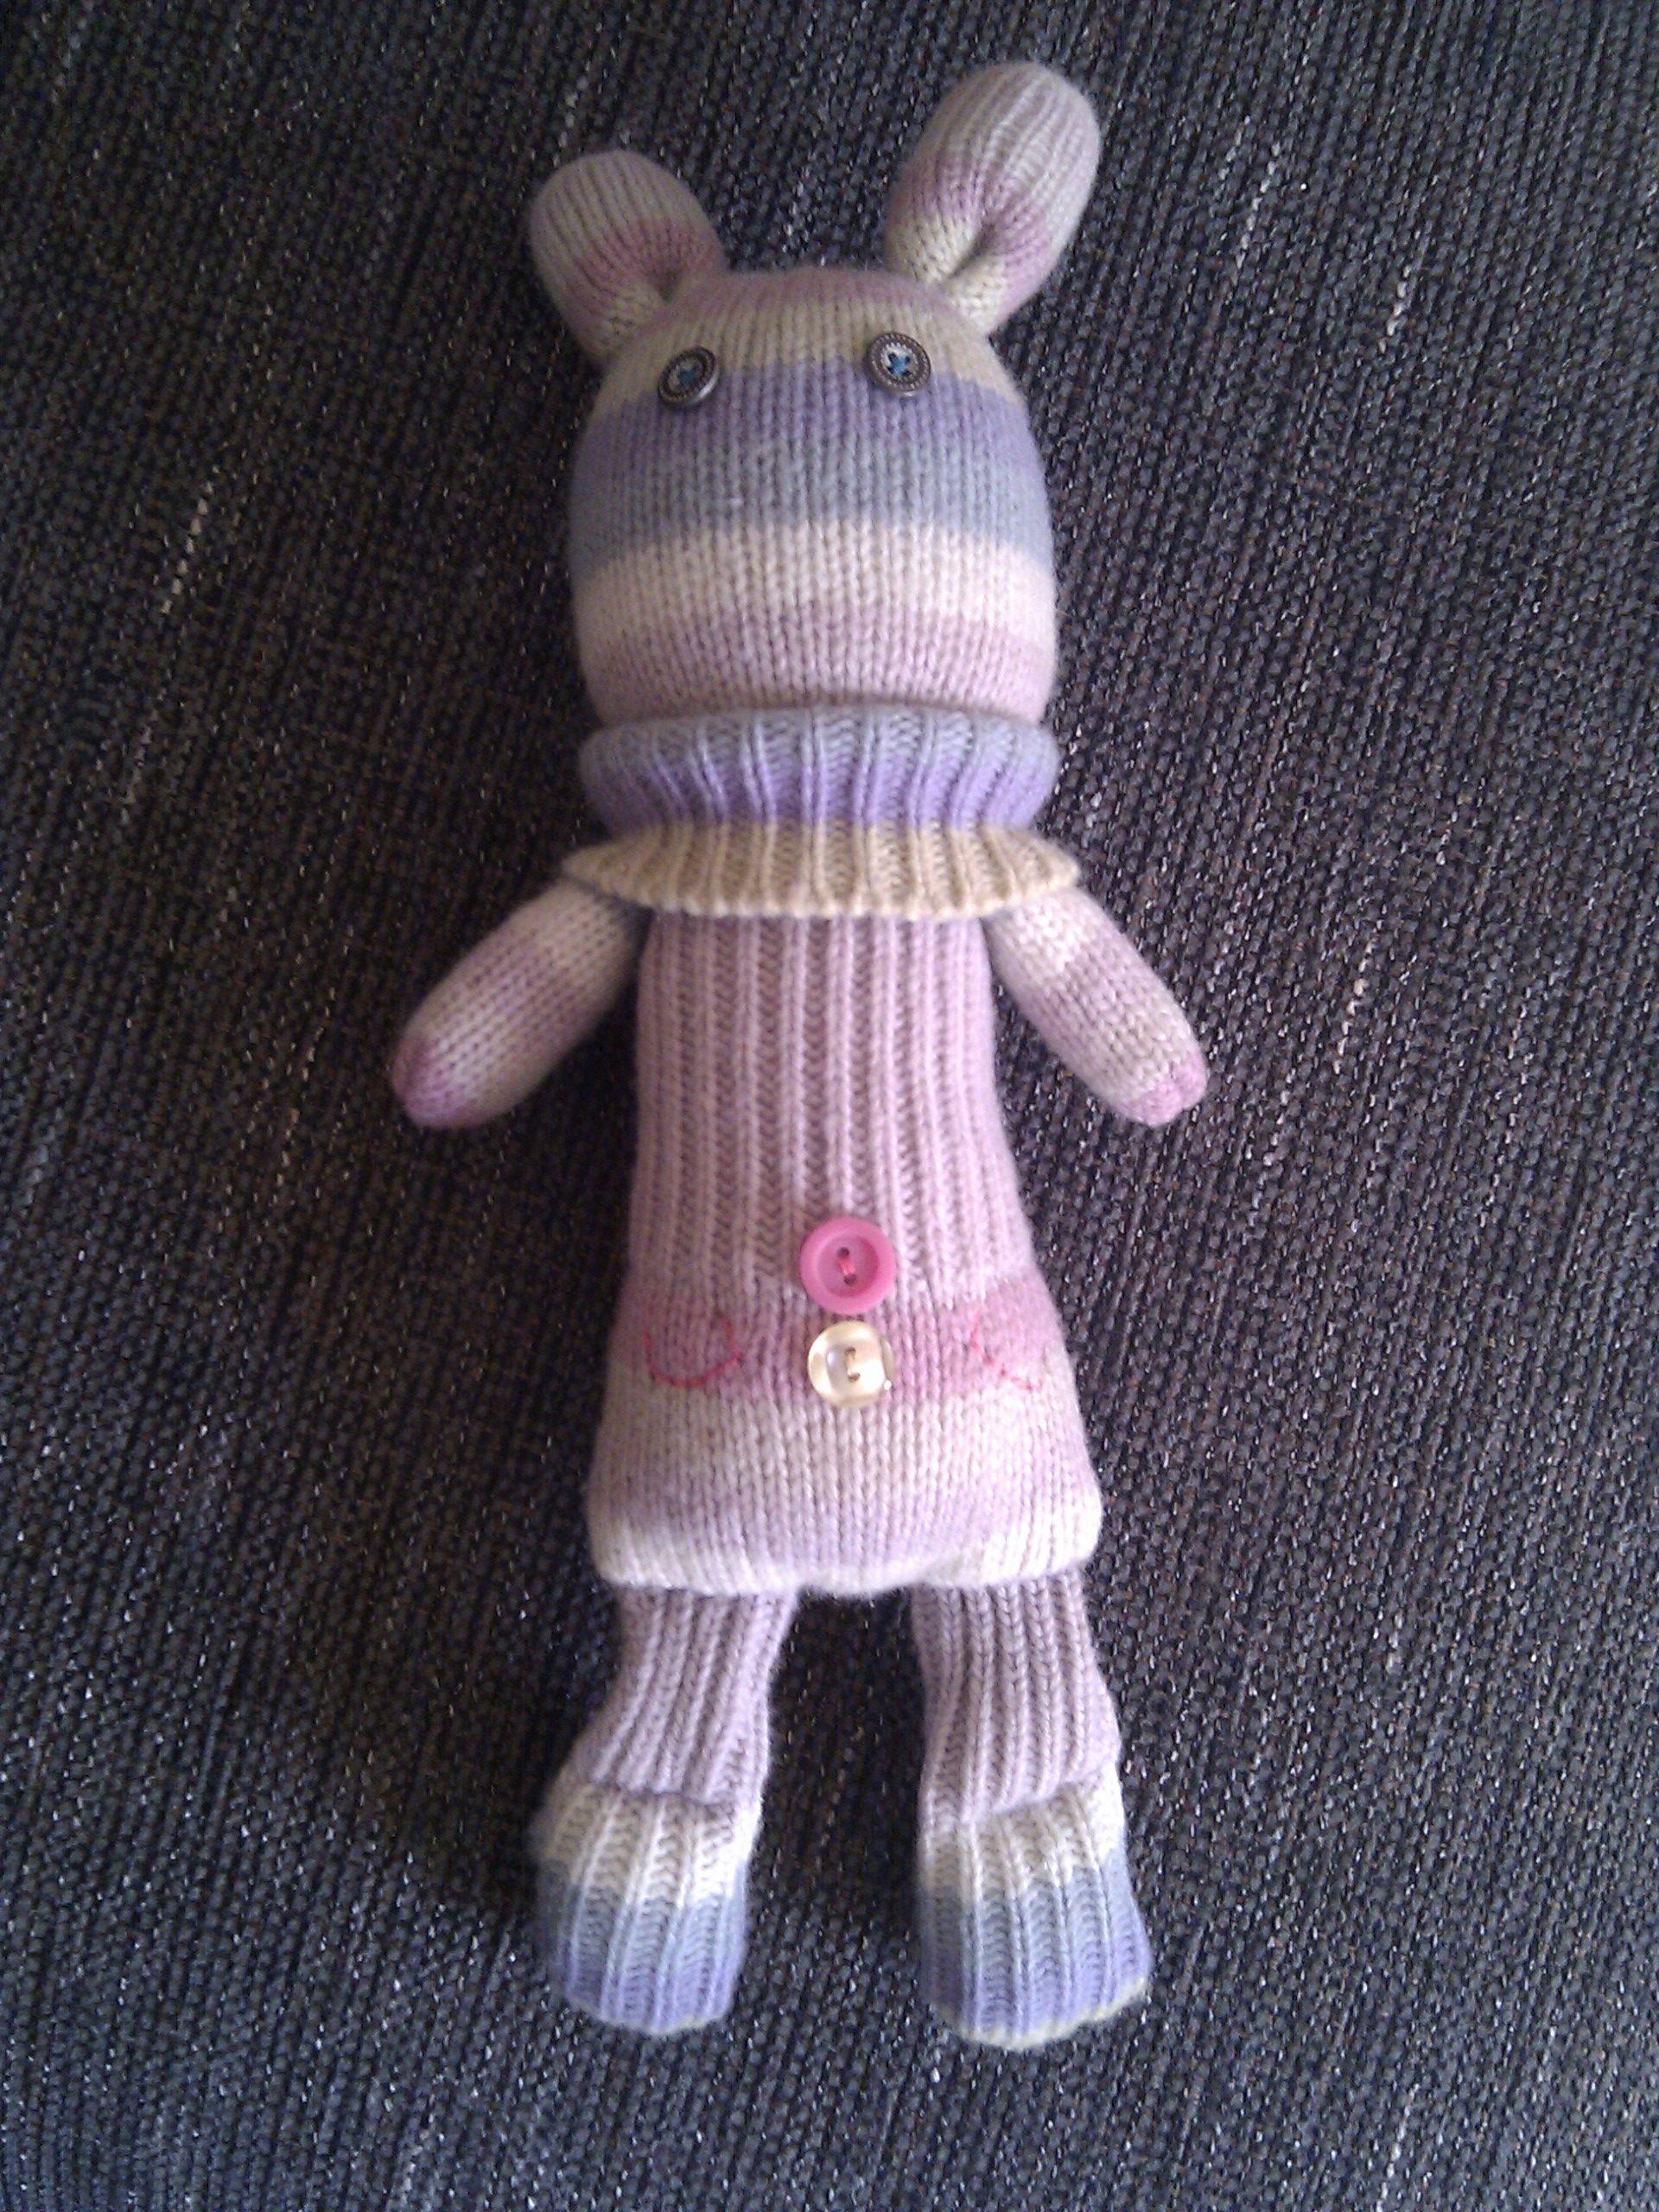 Upcycled mitten rabbit toy